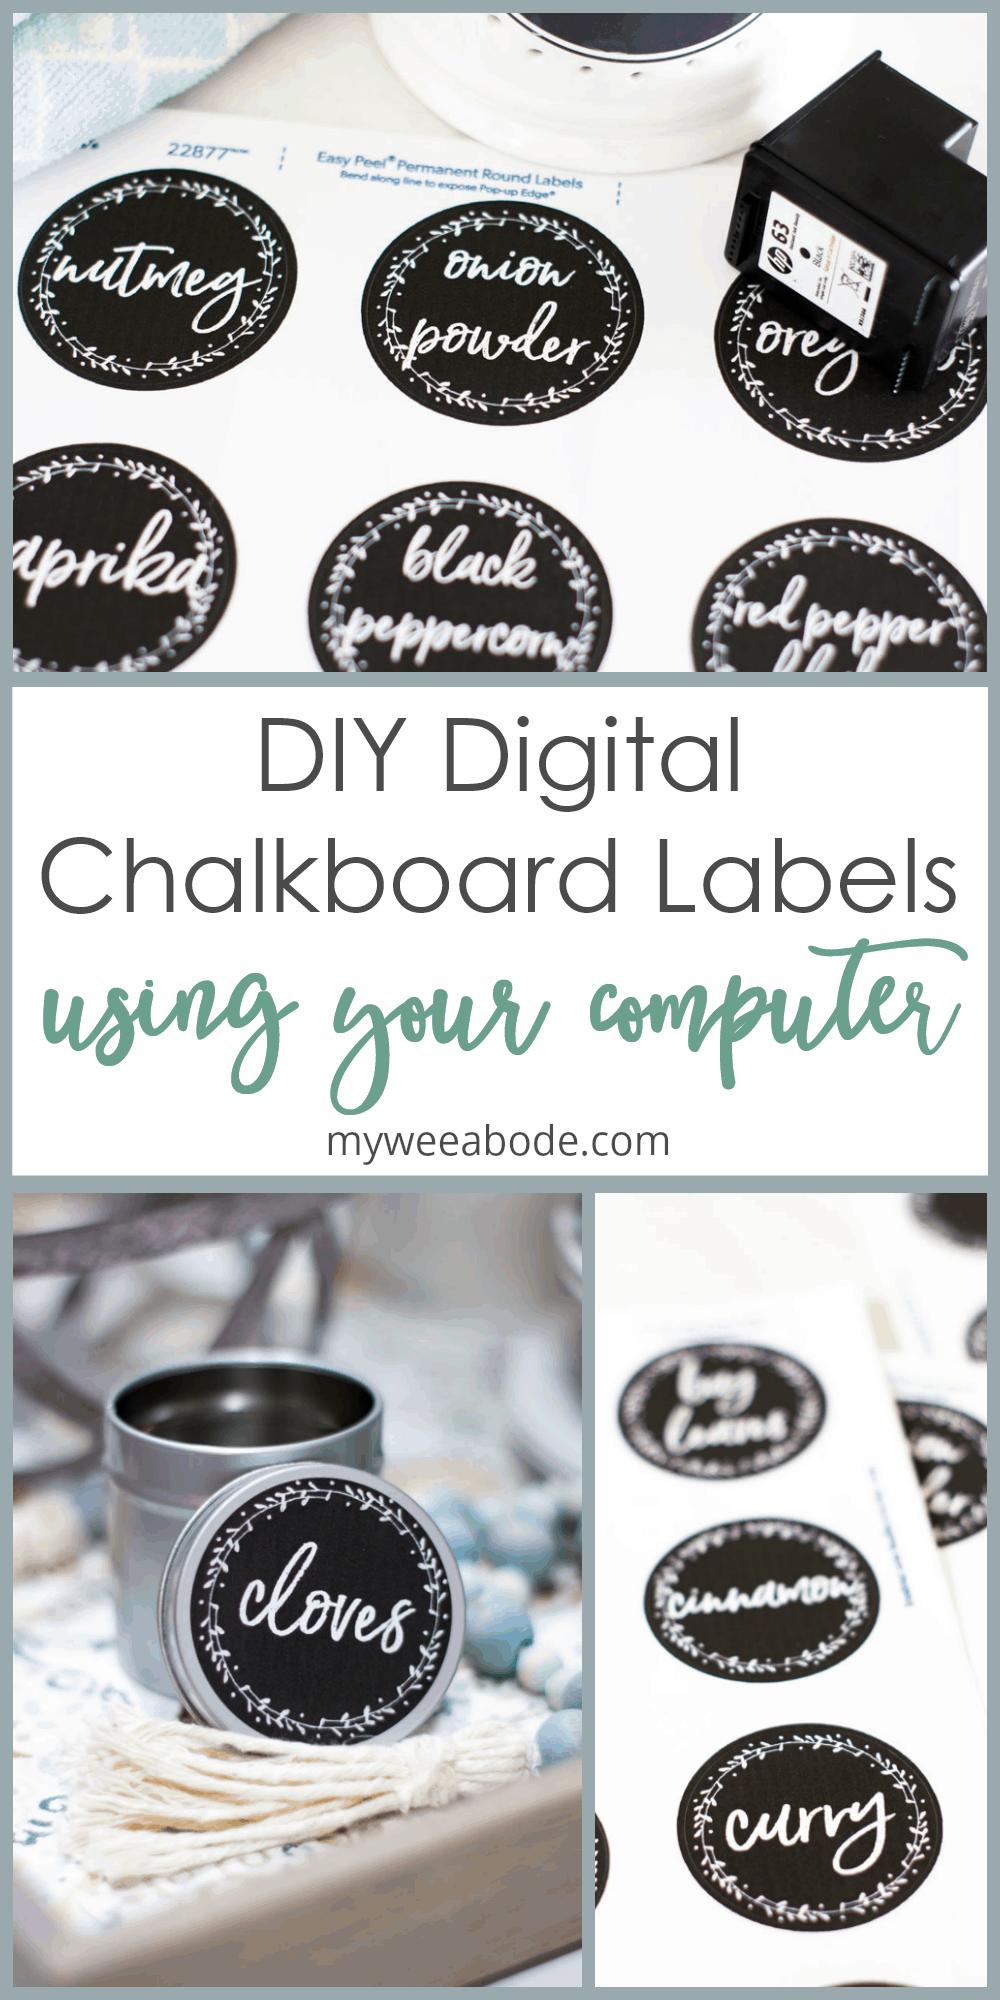 make chalkboard labels using computer